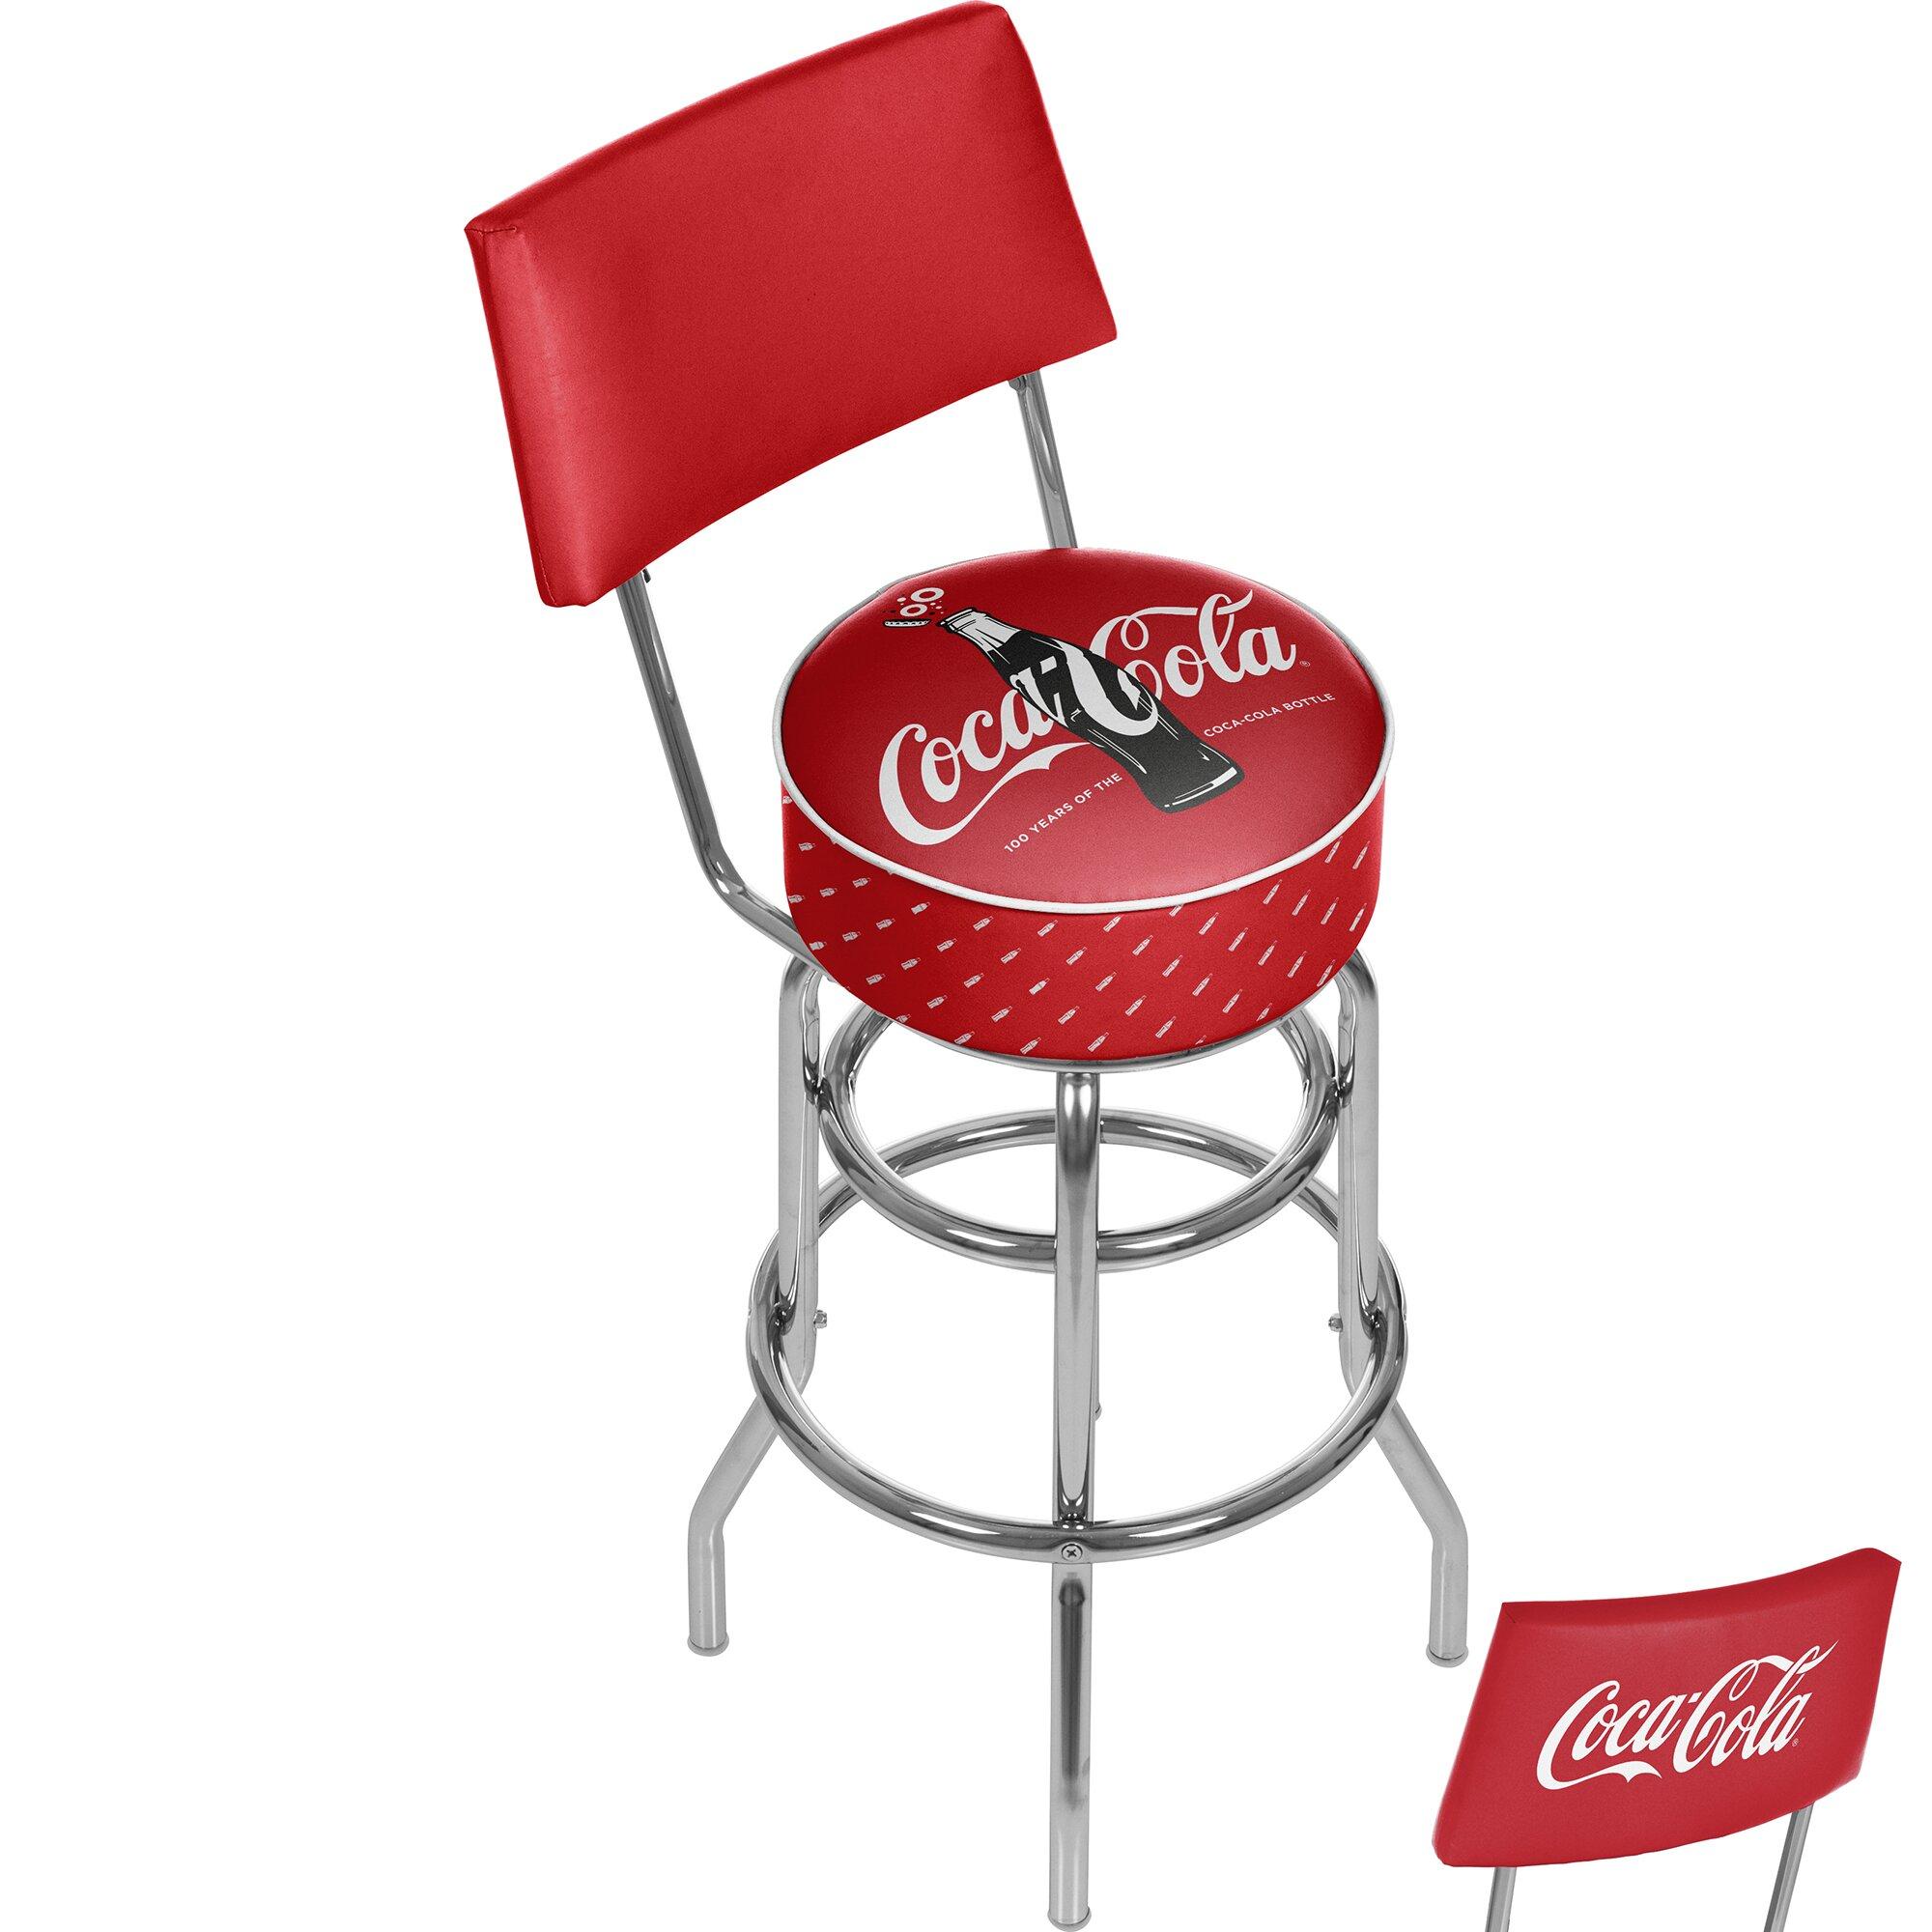 Coca Cola Swivel Bar Stool